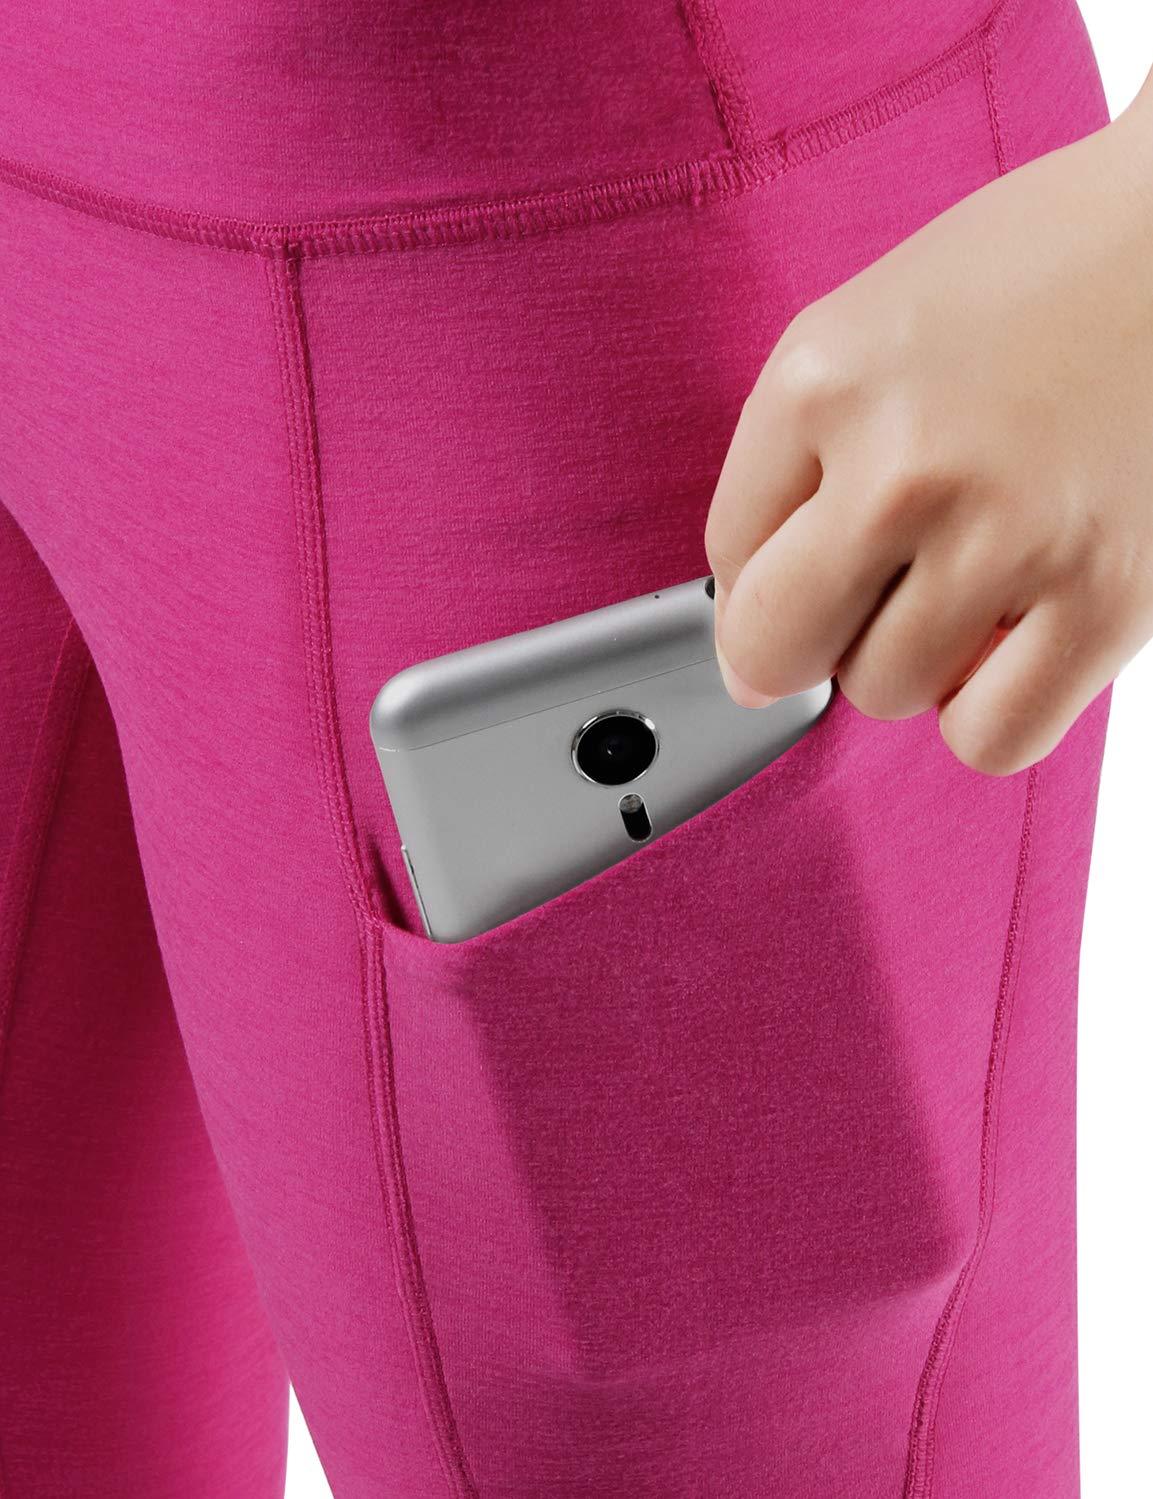 ODODOS High Waist Out Pocket Yoga Capris Pants Tummy Control Workout Running 4 Way Stretch Yoga Leggings,Fuchsia,X-Small by ODODOS (Image #4)